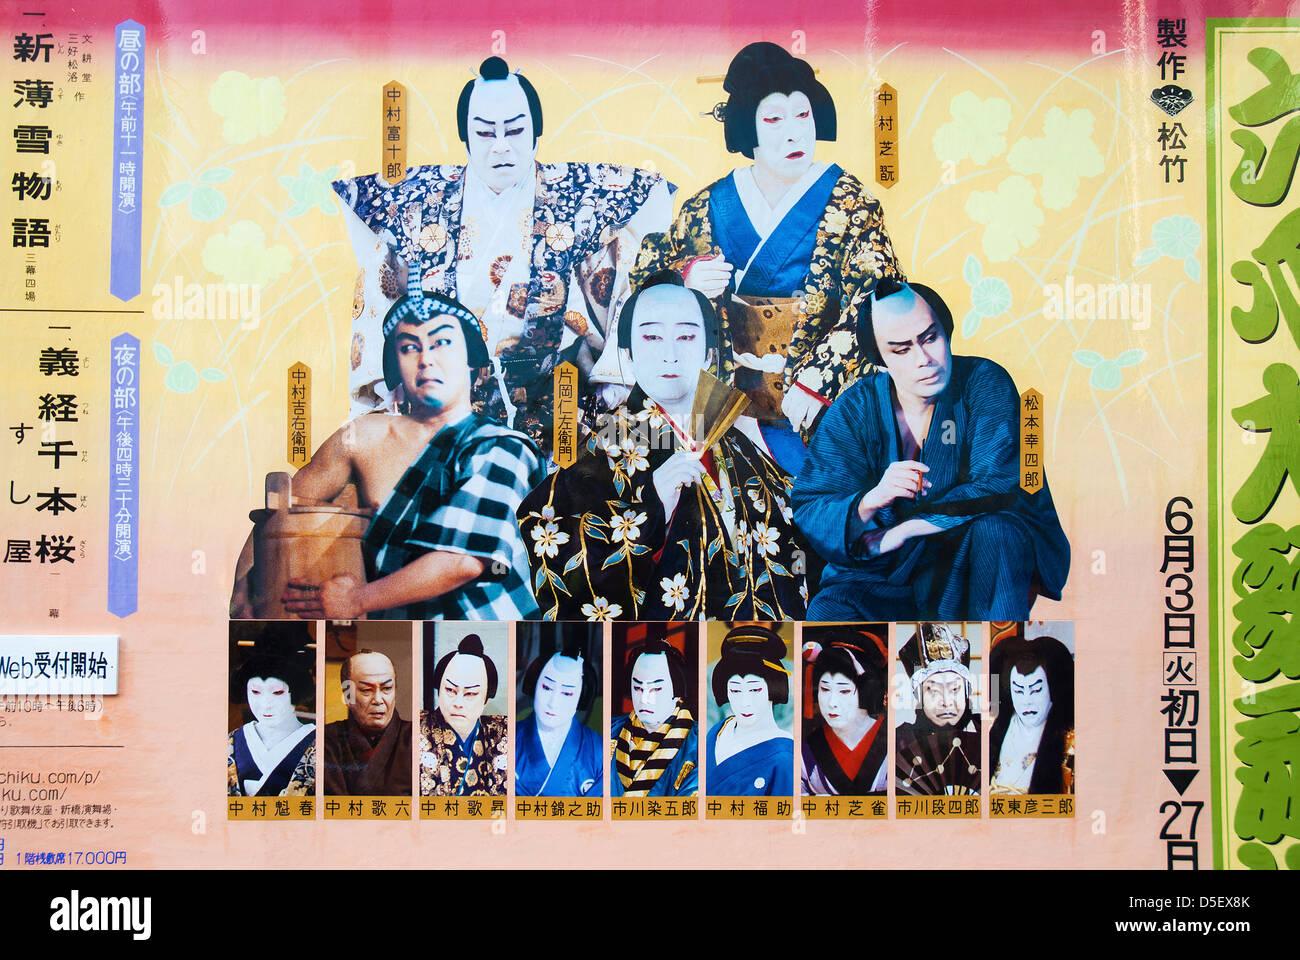 kabuki actors poster in kyoto japan - Stock Image